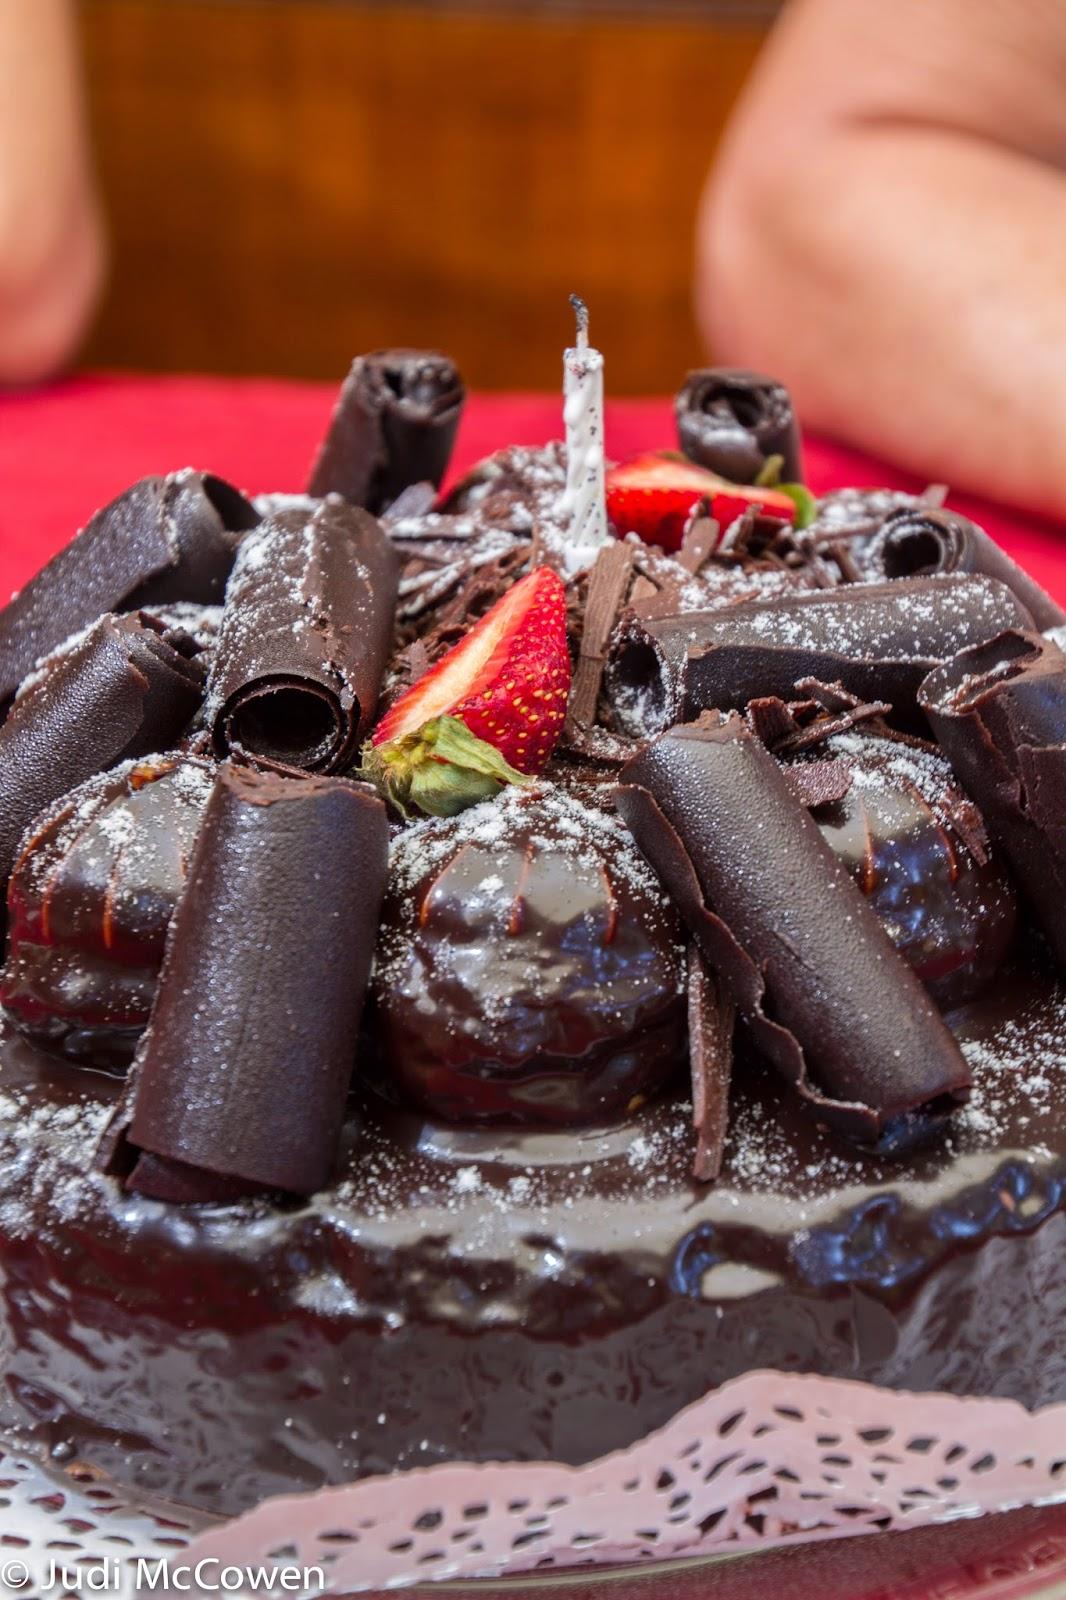 JUstDreamInparadise The Best Tasting Birthday Cake EVER